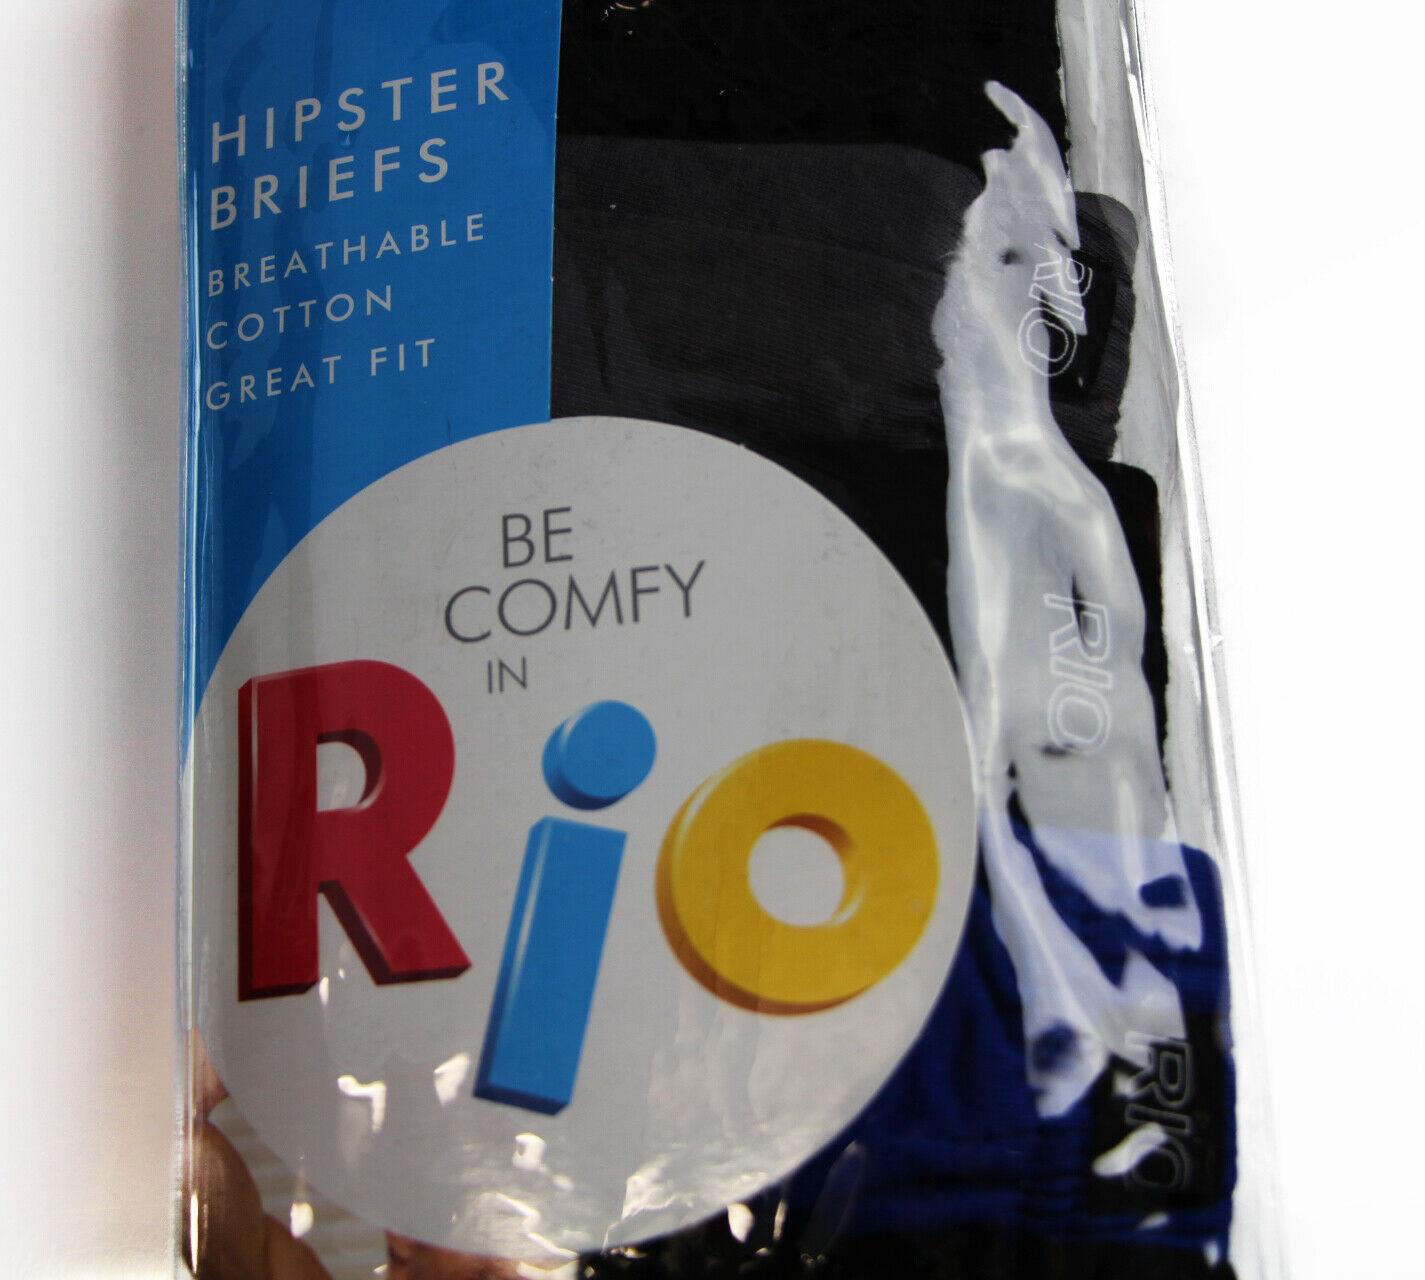 MENS-RIO-7-PACK-SEXY-HIPSTER-BIKINI-BRIEF-COTTON-UNDERWEAR-JOCKS-BLACK-BRIEFS thumbnail 5